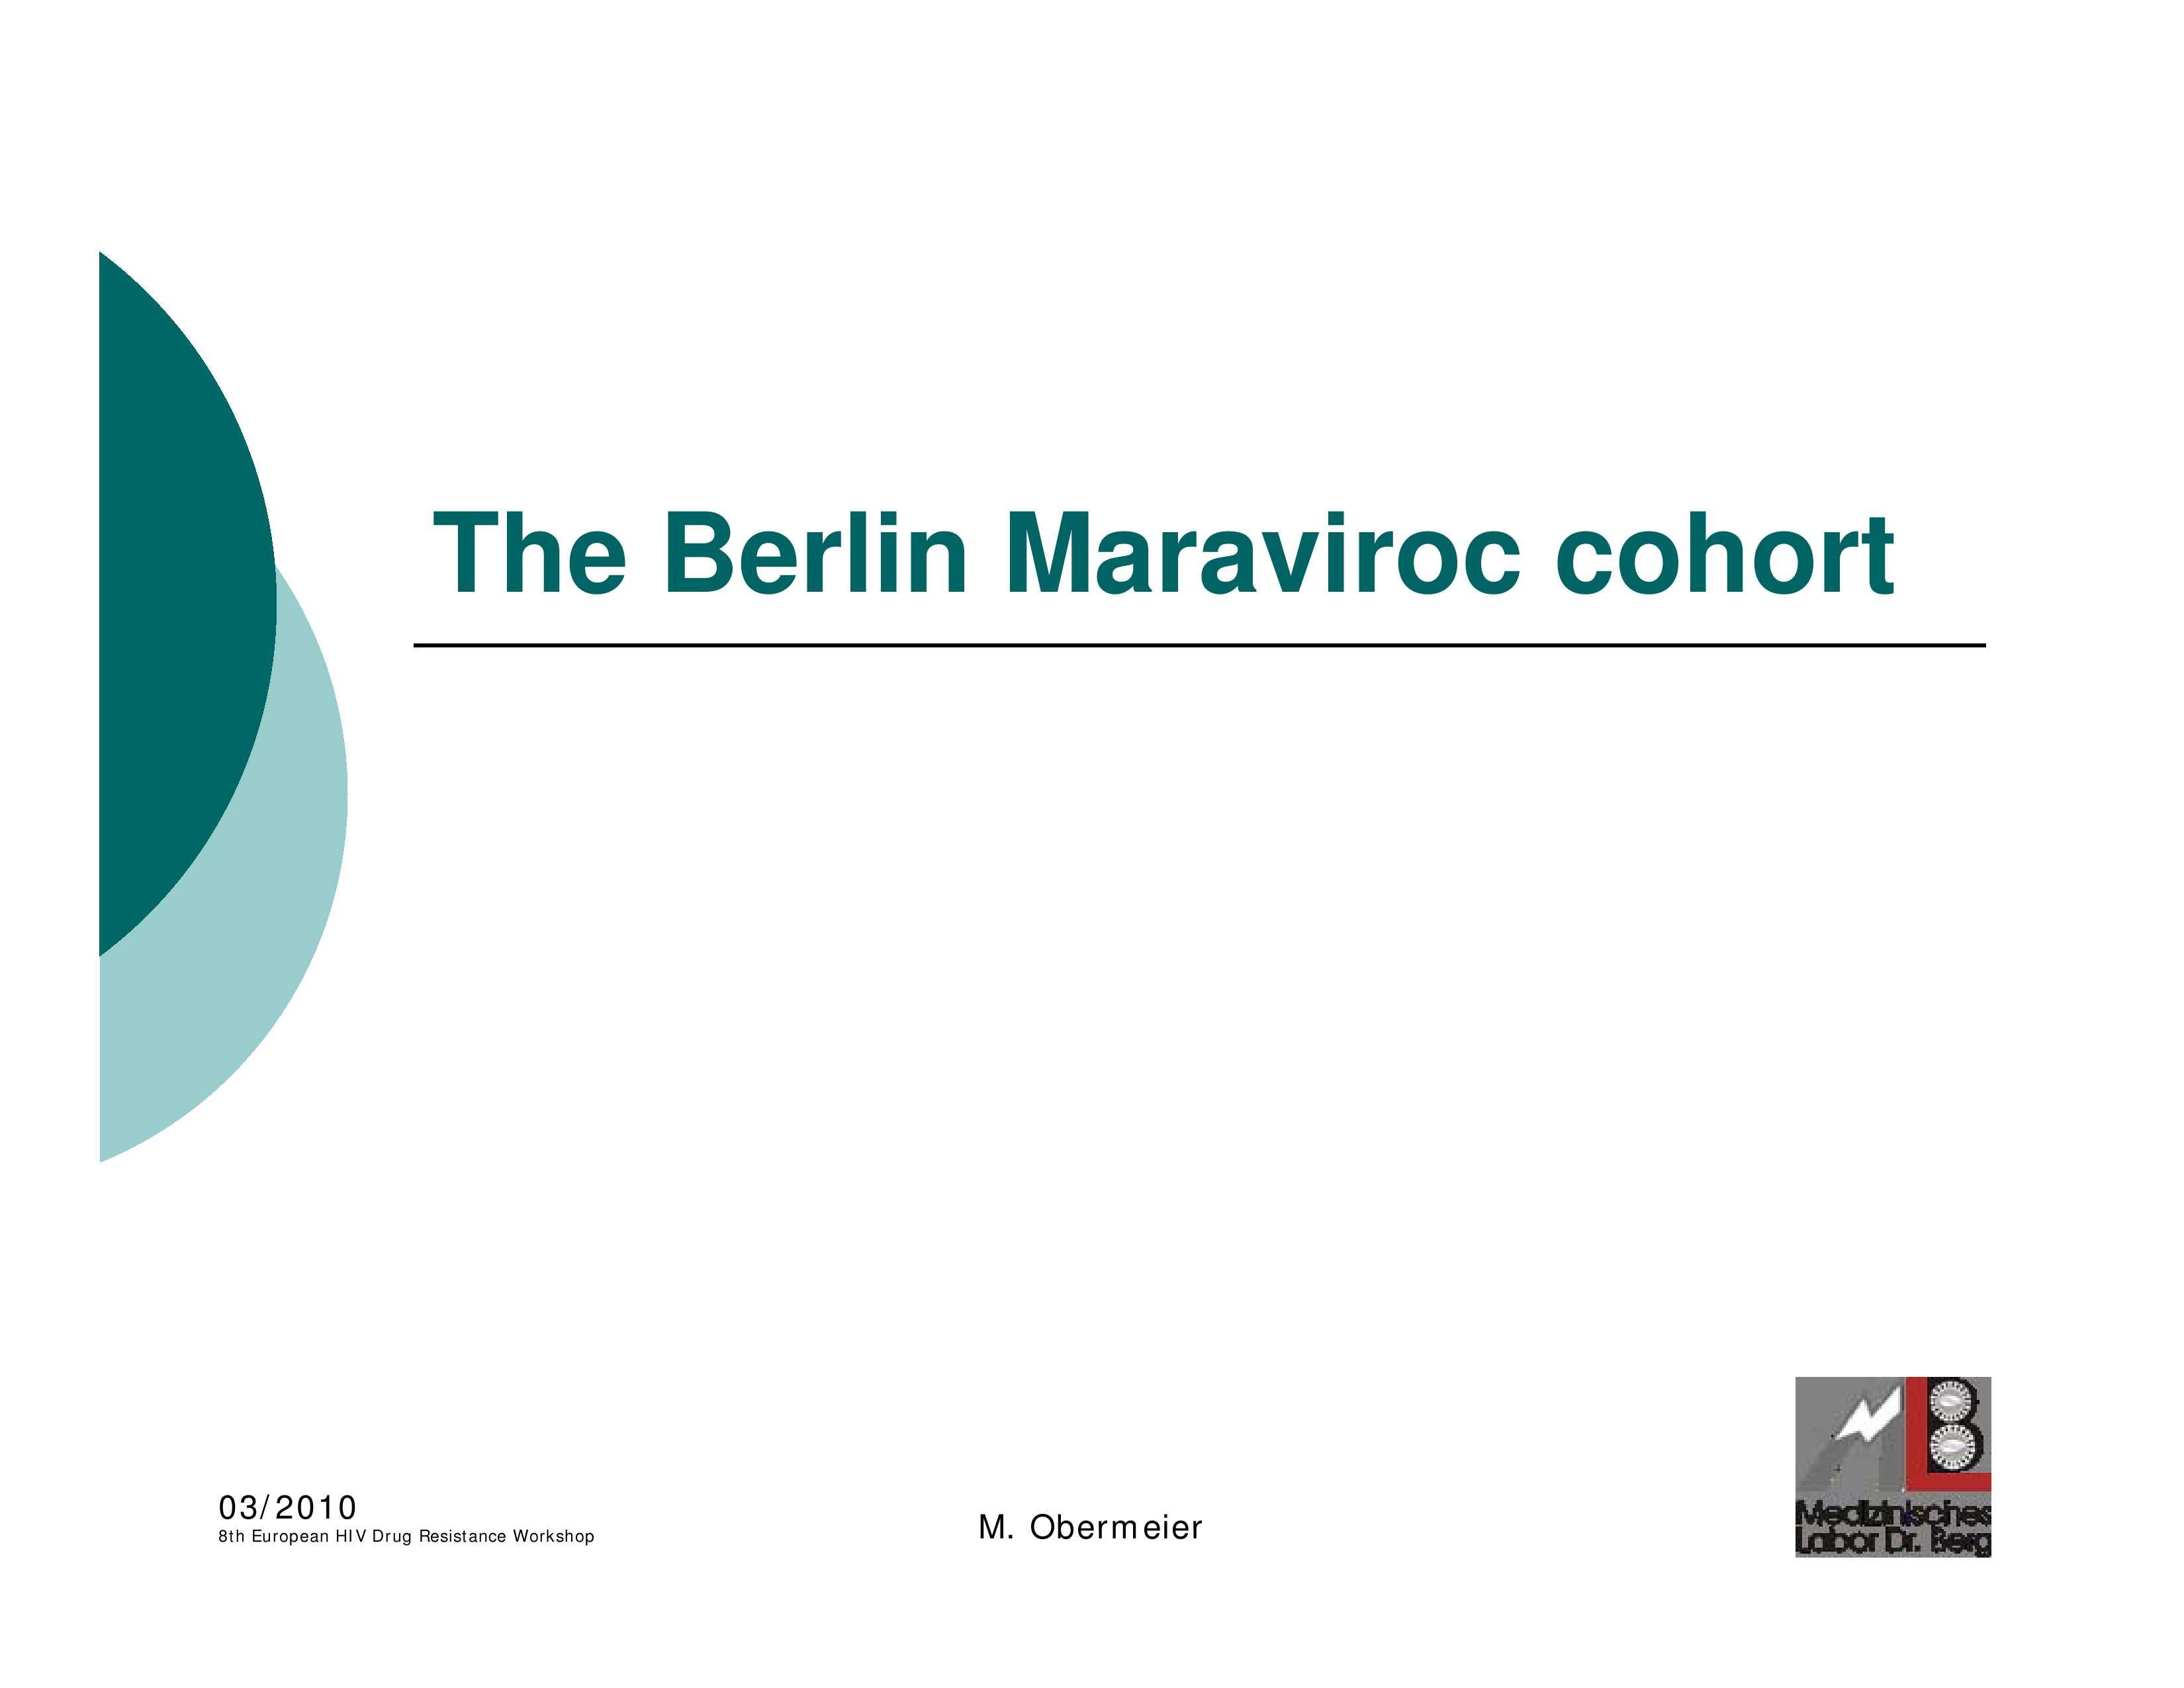 05_Mobermeier_MVC_Cohort_b-000001.jpeg